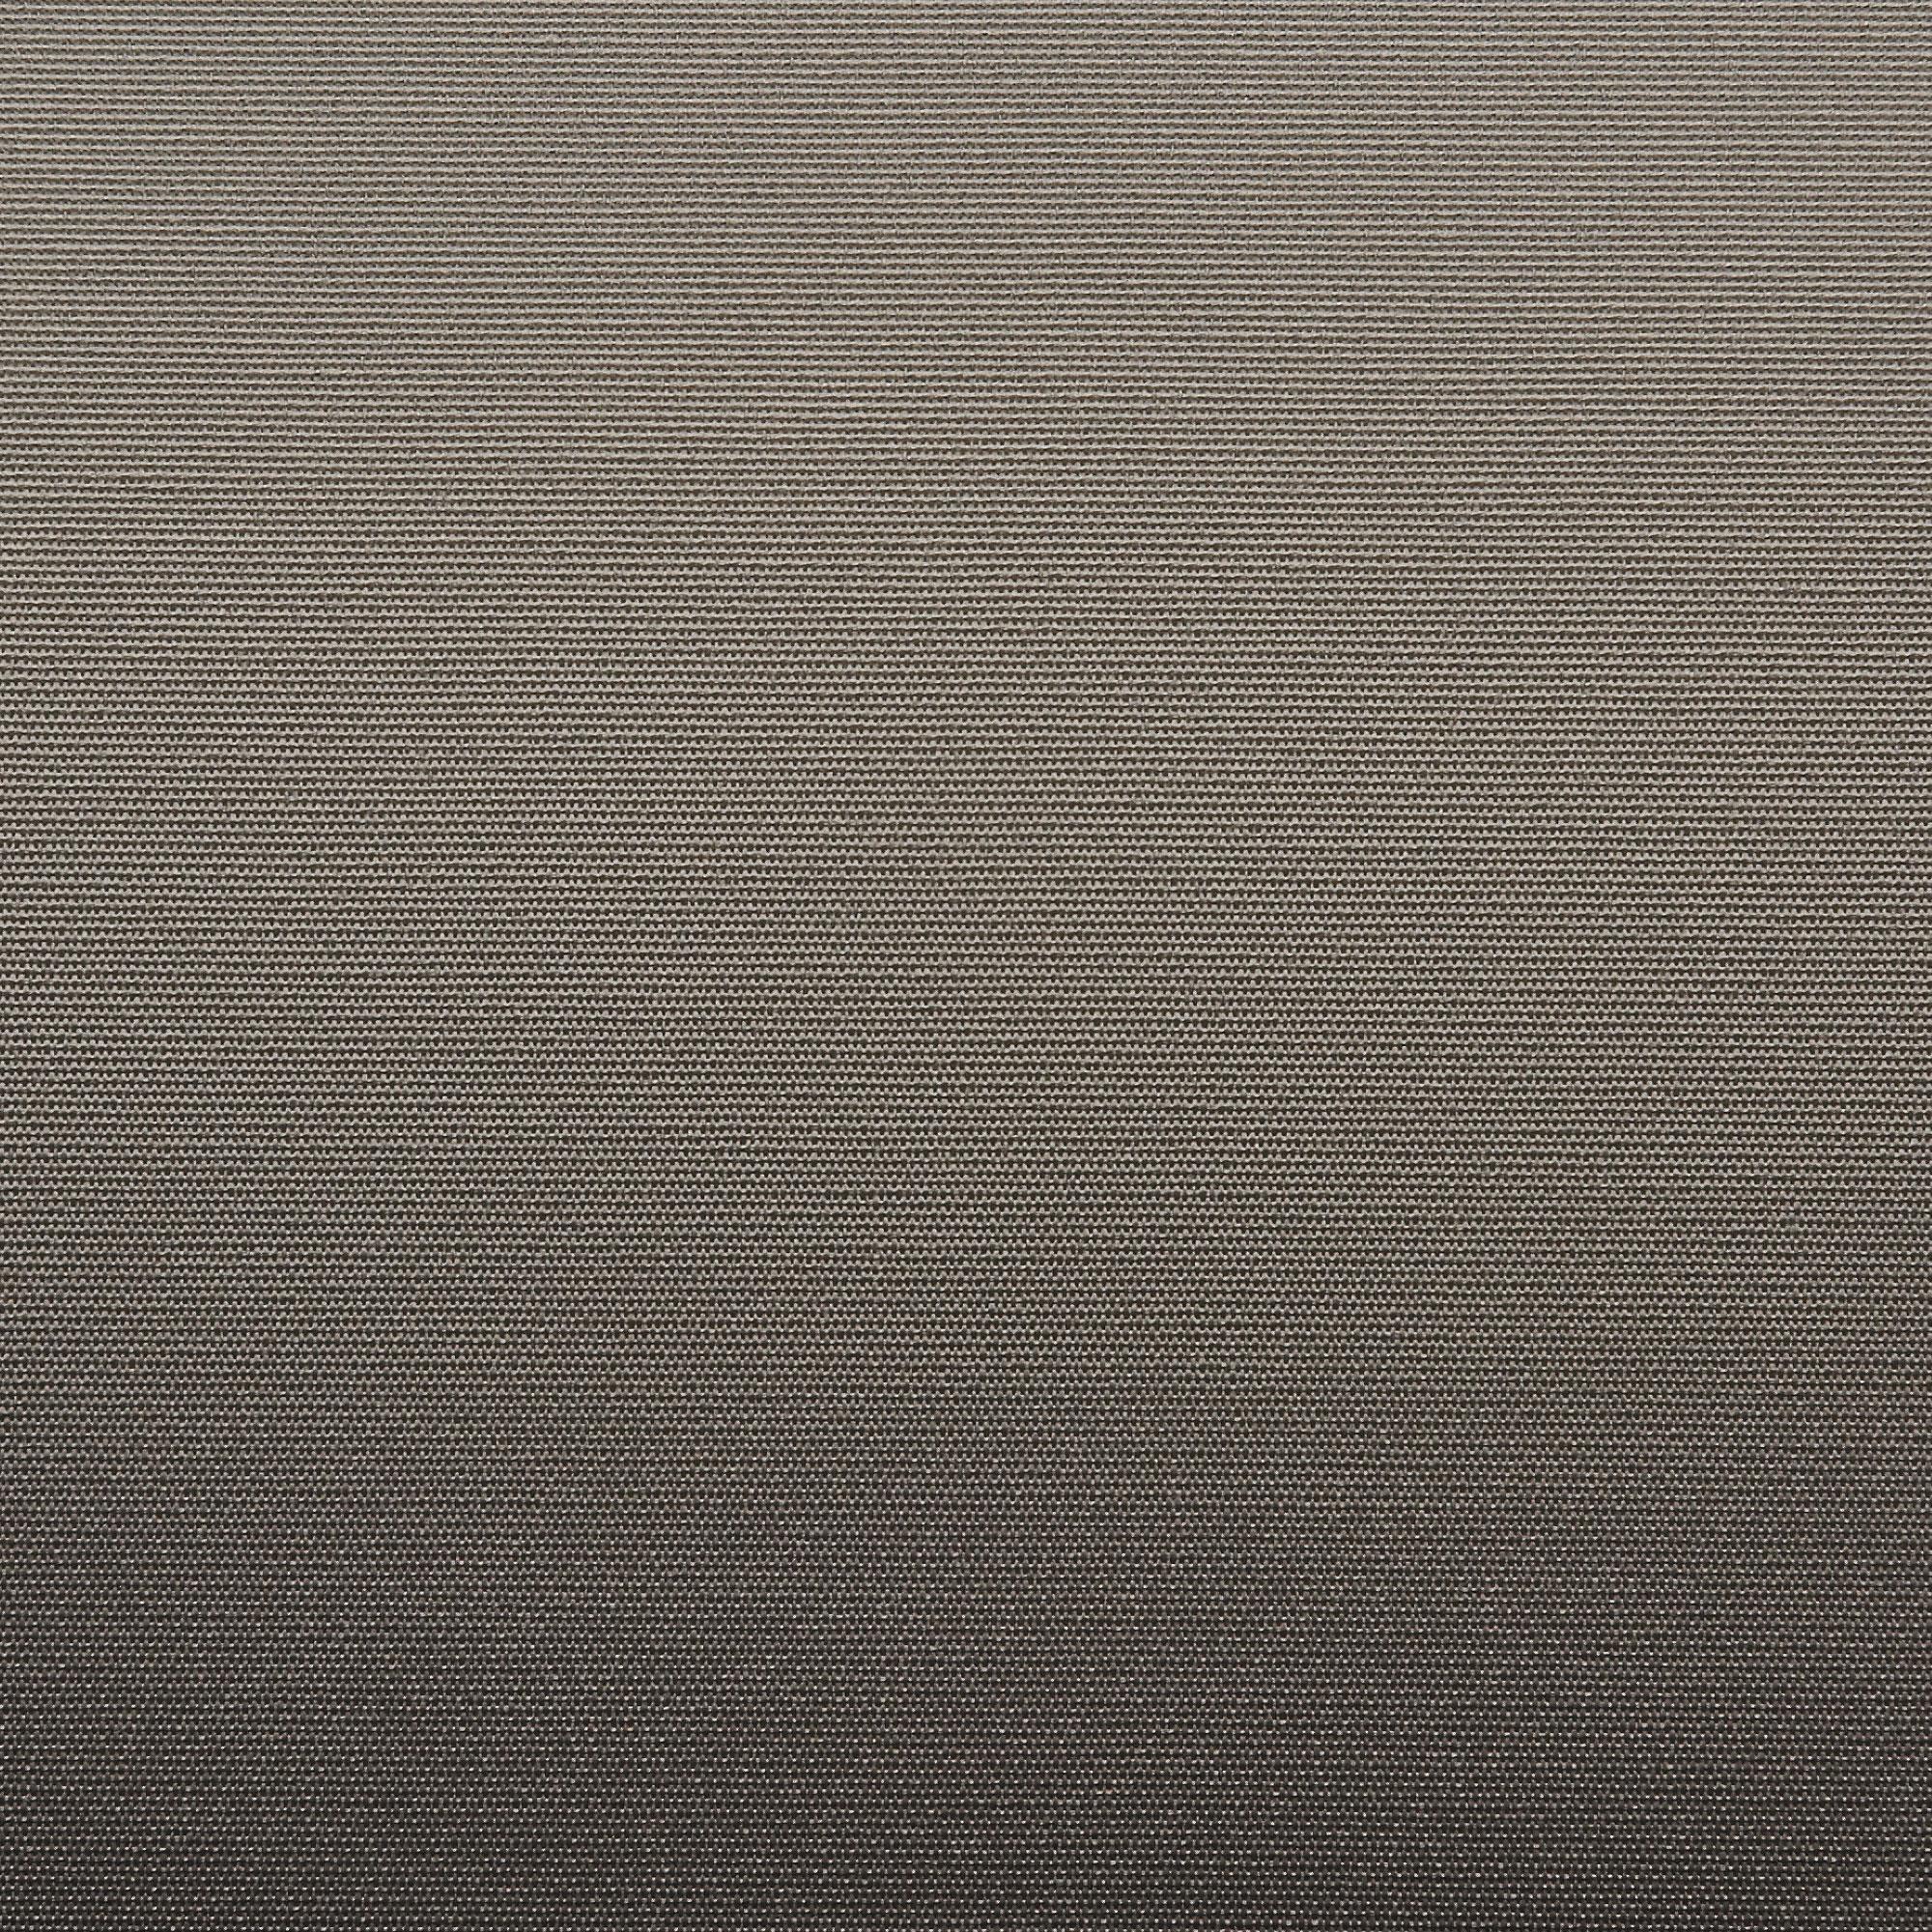 swatch-7000-v39-graphite-web.jpg